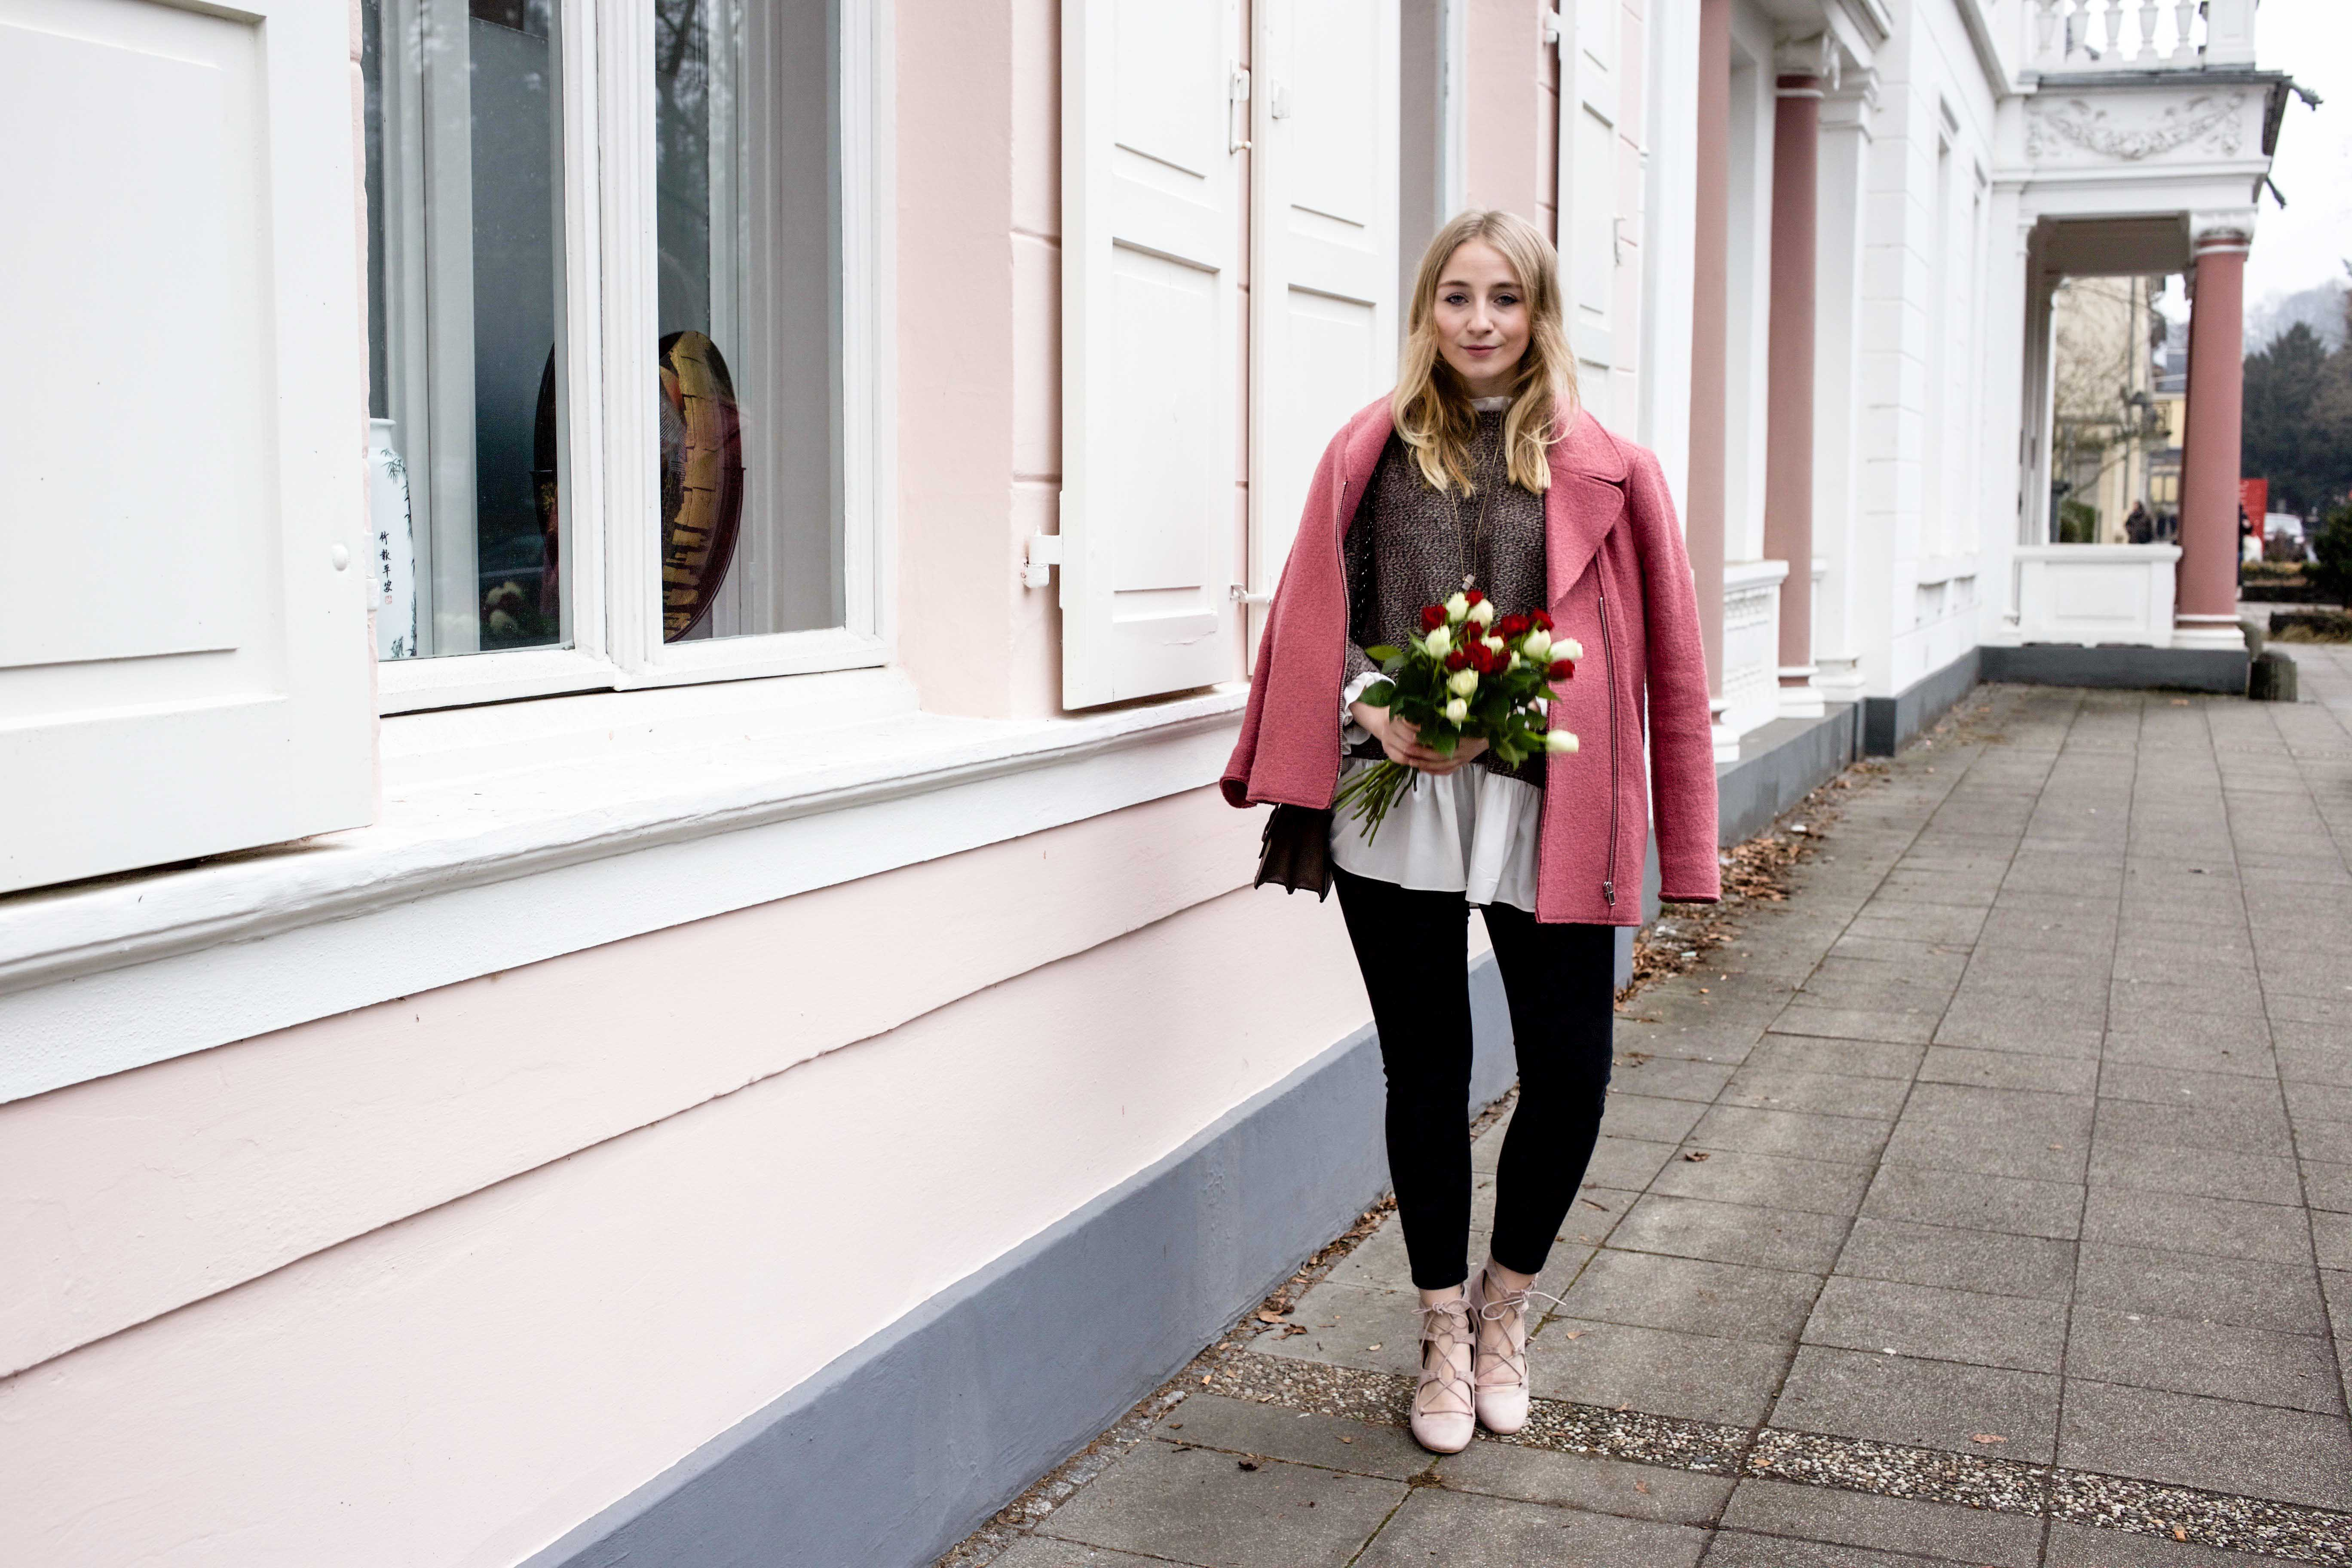 be-my-valentine-romantisches-valentinstags-outfit-valentinstag-inspiration-fashionblog_0178